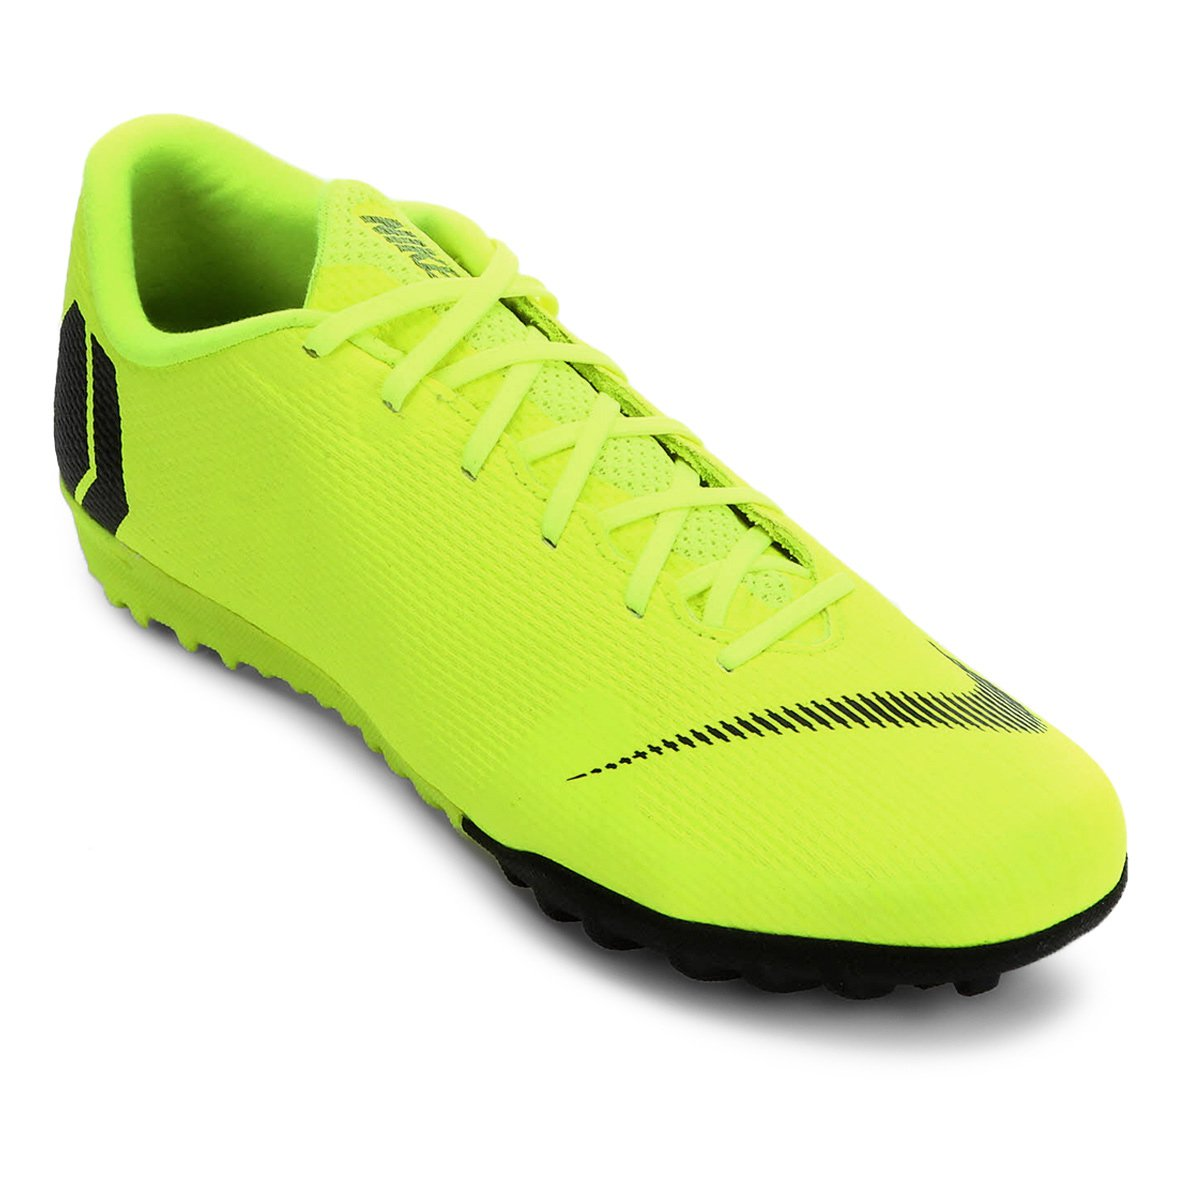 Chuteira Society Nike Mercurial Vapor 12 Academy - Amarelo e Preto - Compre  Agora  a5d036c7065f2